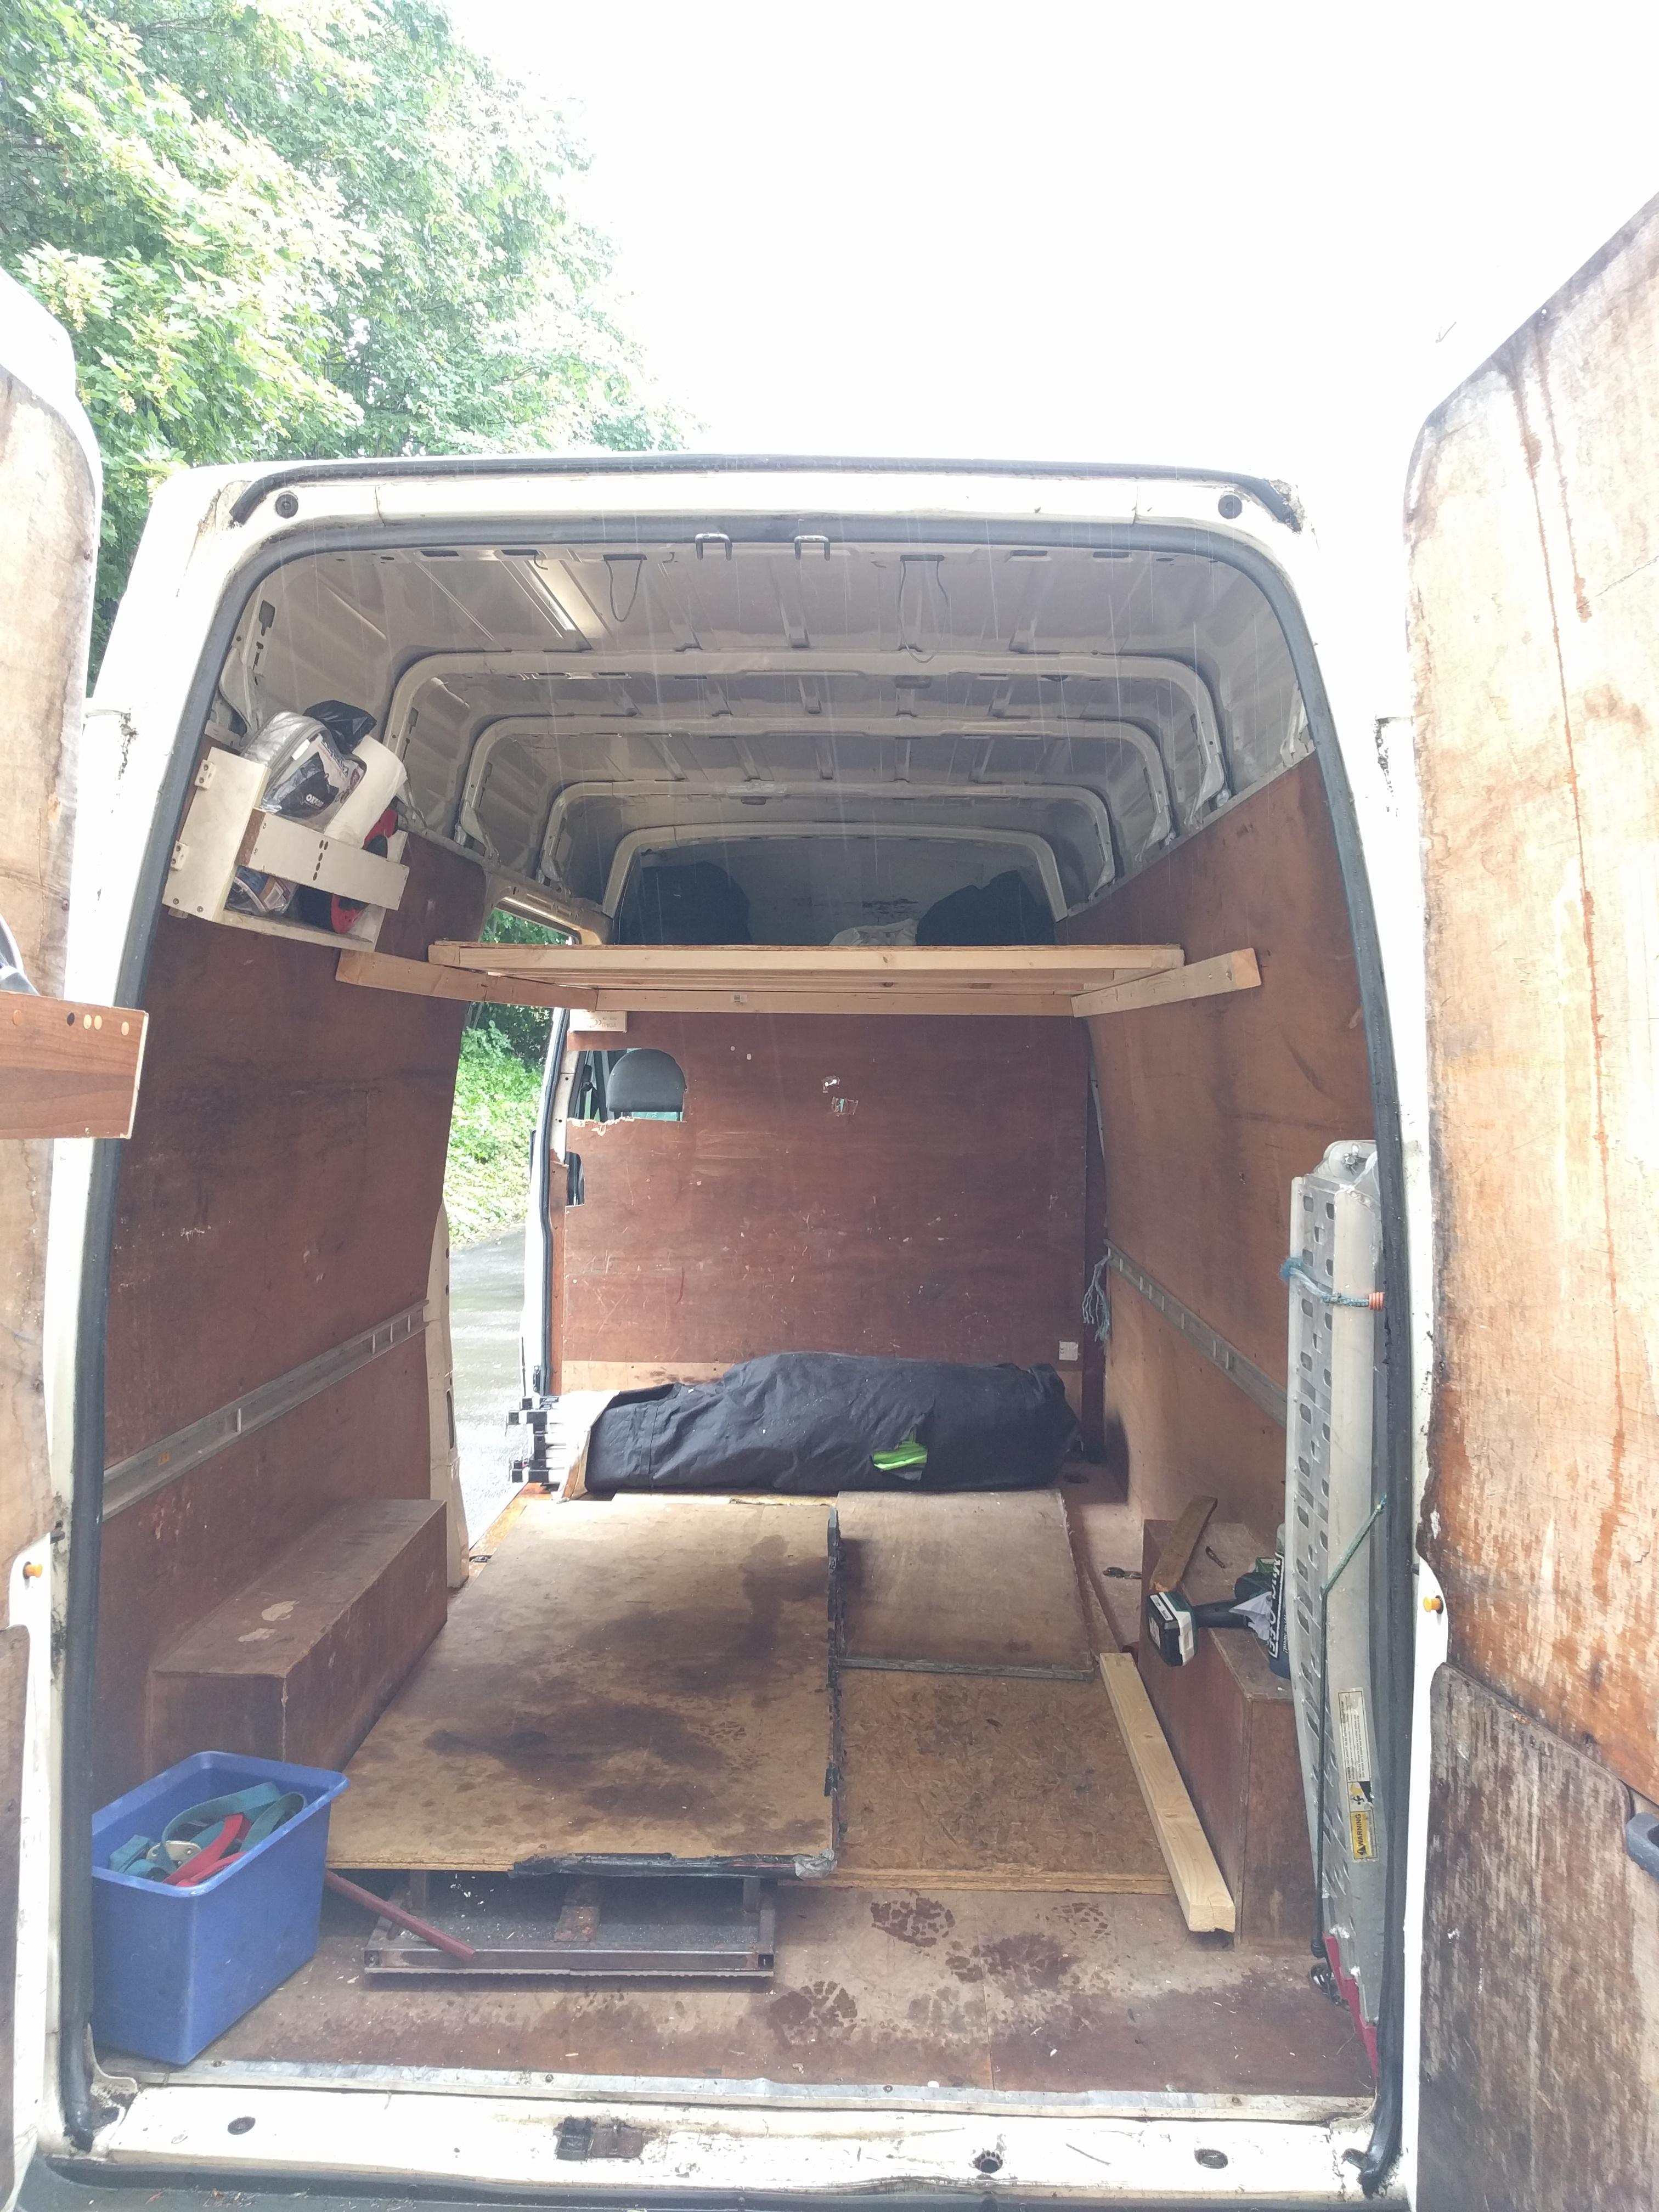 Van with a mezzanine